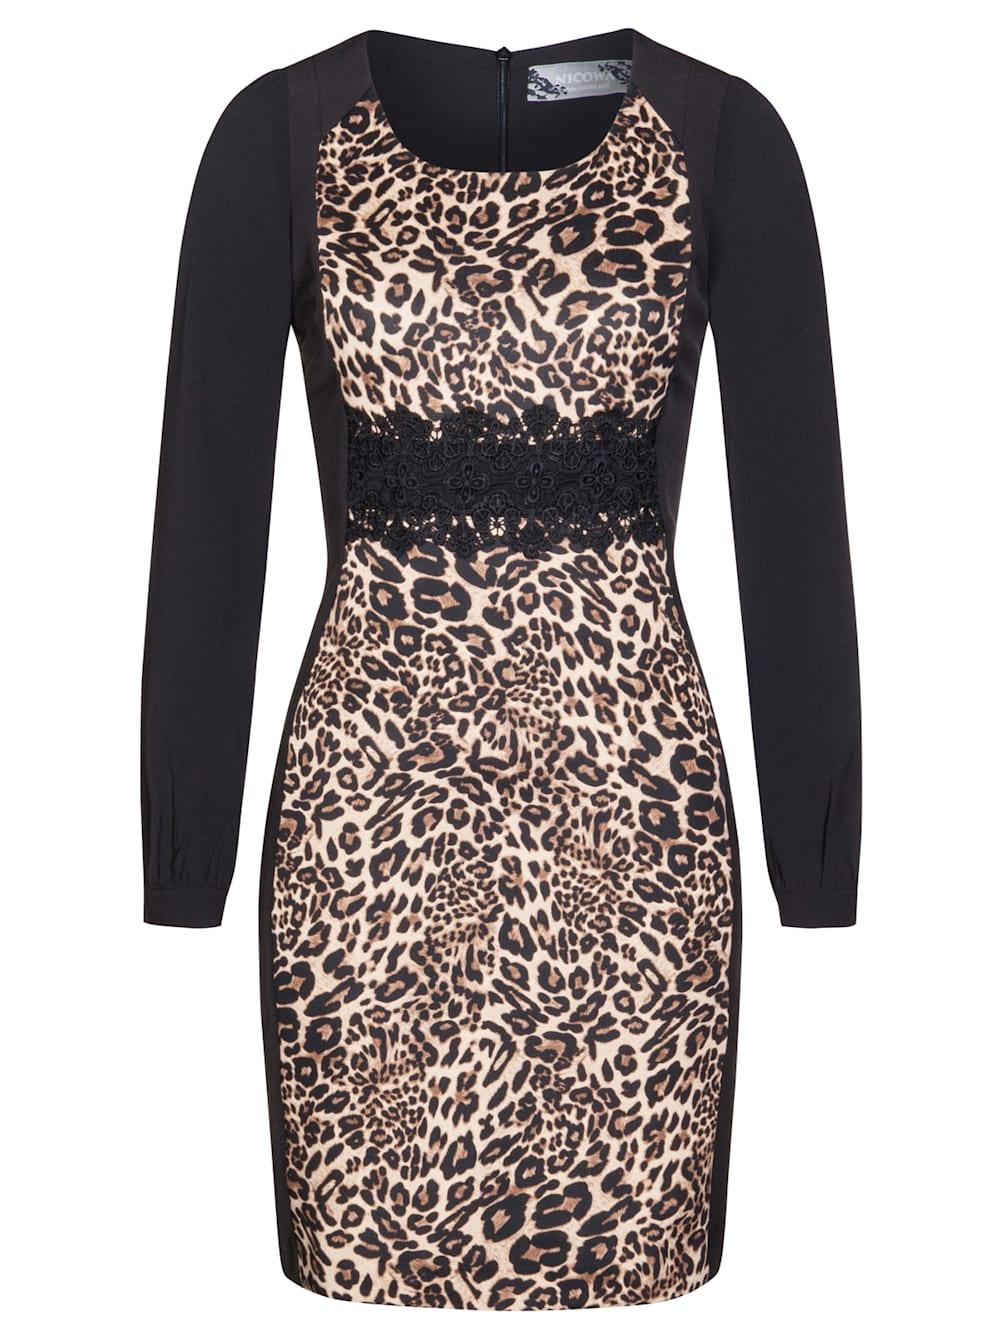 Nicowa Edles Kleid MAJA mit extravagantem Leopardenmuster  Klingel